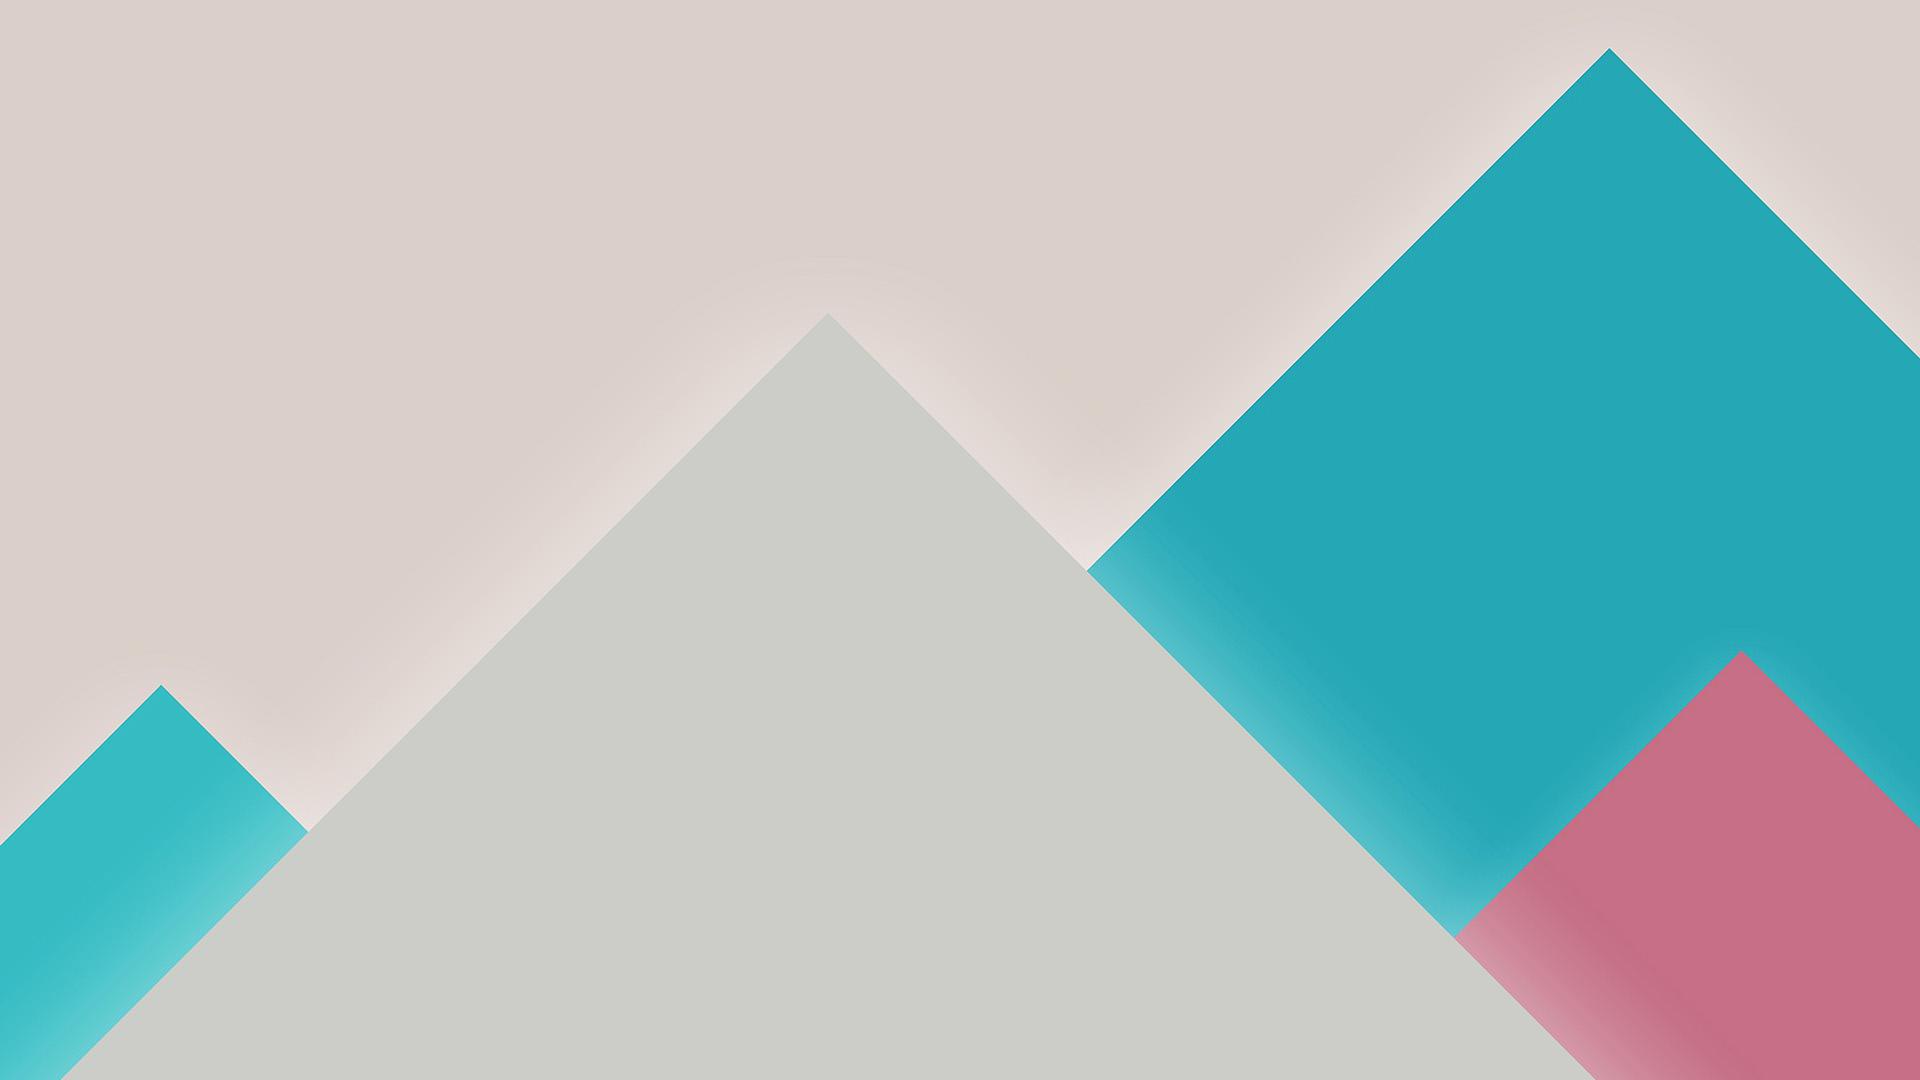 Android Lollipop Wallpaper Hd 1080p Wallpaper For Desktop Laptop Vk53 Android Lollipop